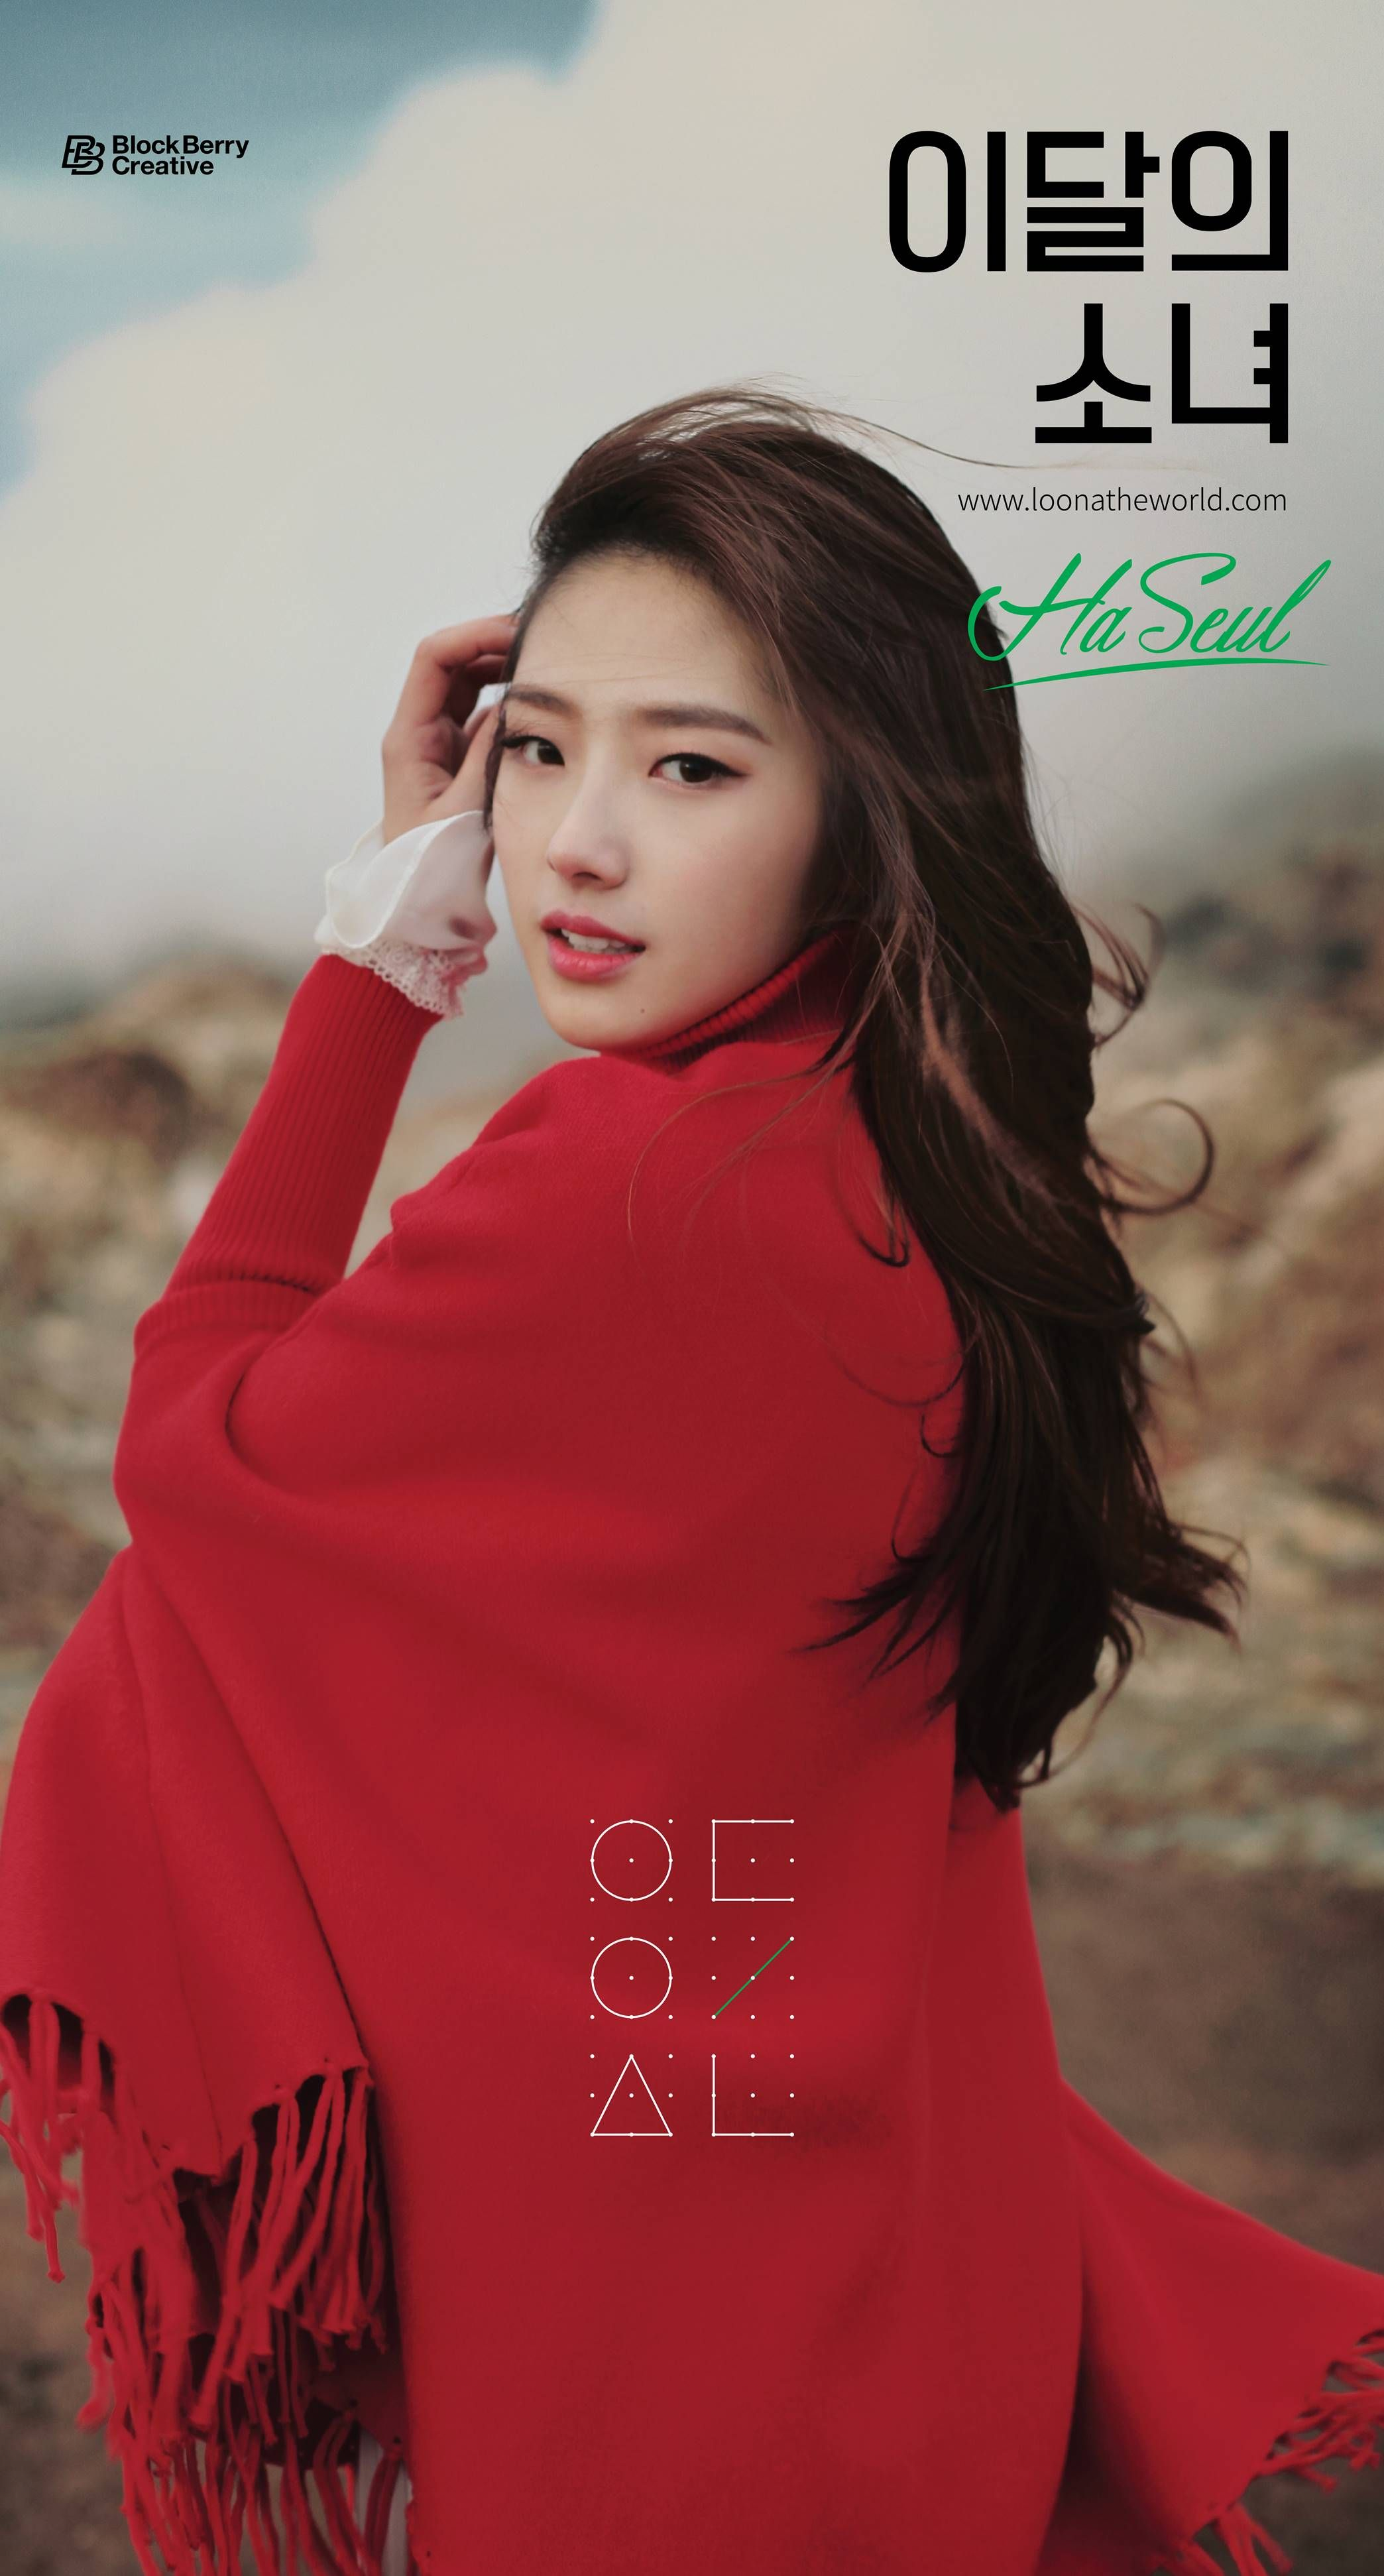 Loona 이달의 소녀 Haseul ˏˋ L O O N A ˎˊ Pinterest Kpop